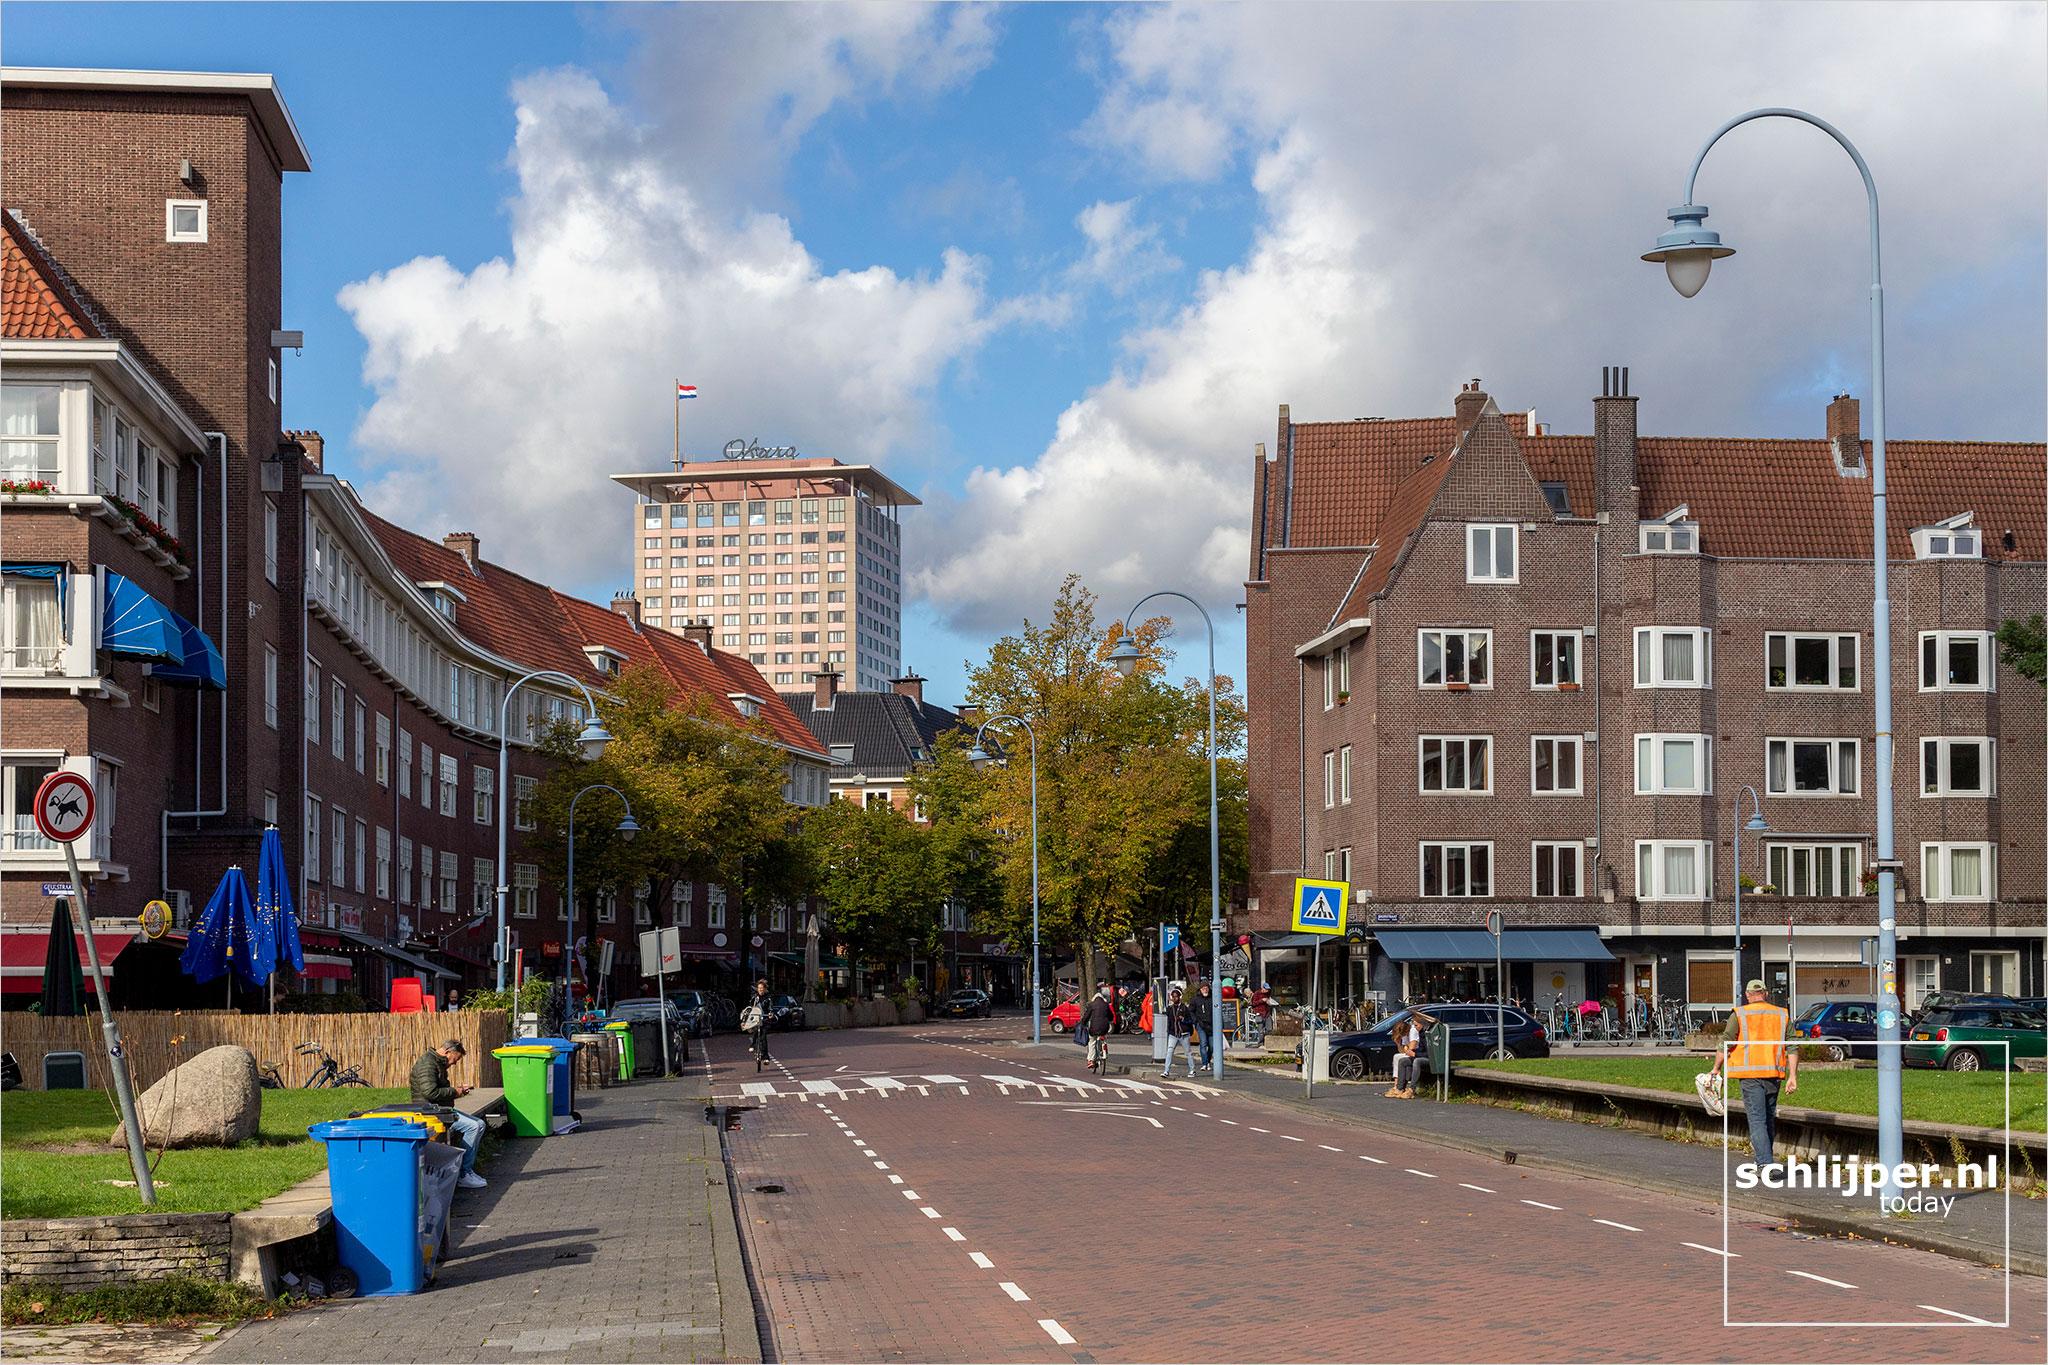 The Netherlands, Amsterdam, 6 oktober 2021